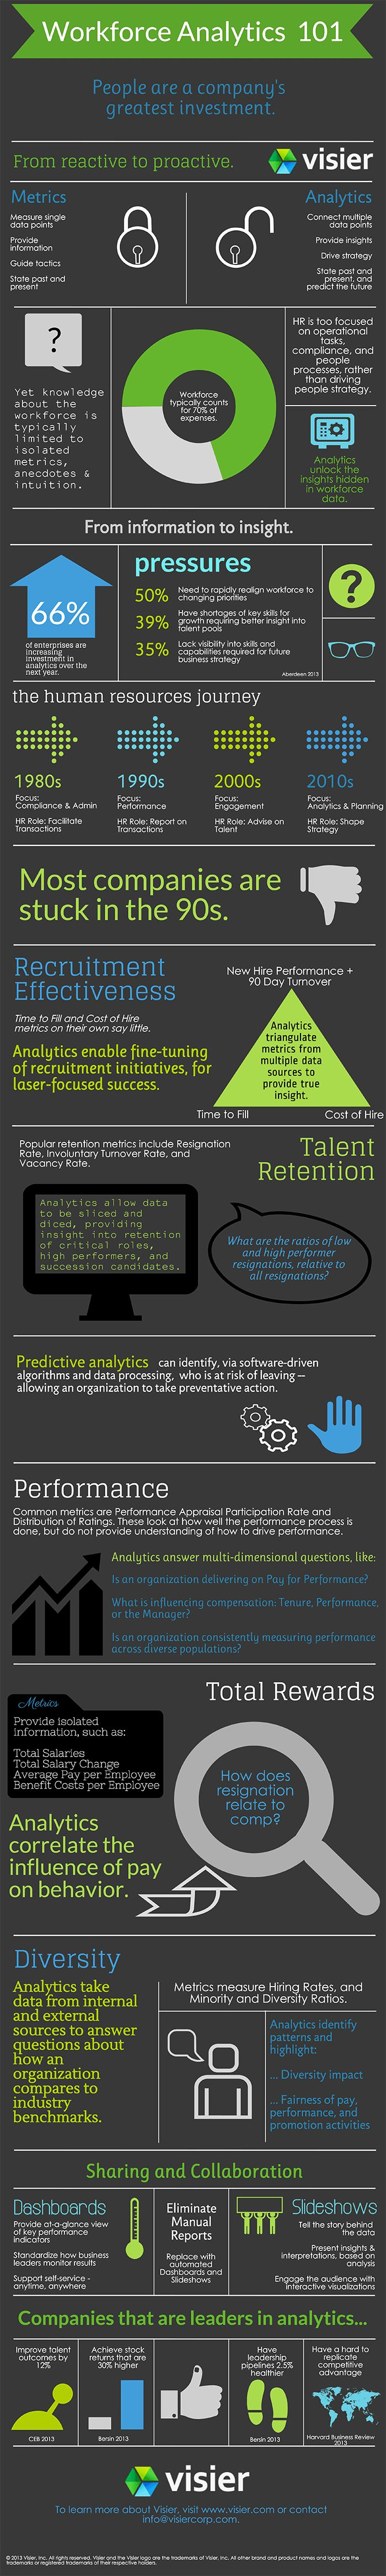 Workforce Analytics 101 Infographic from Visier